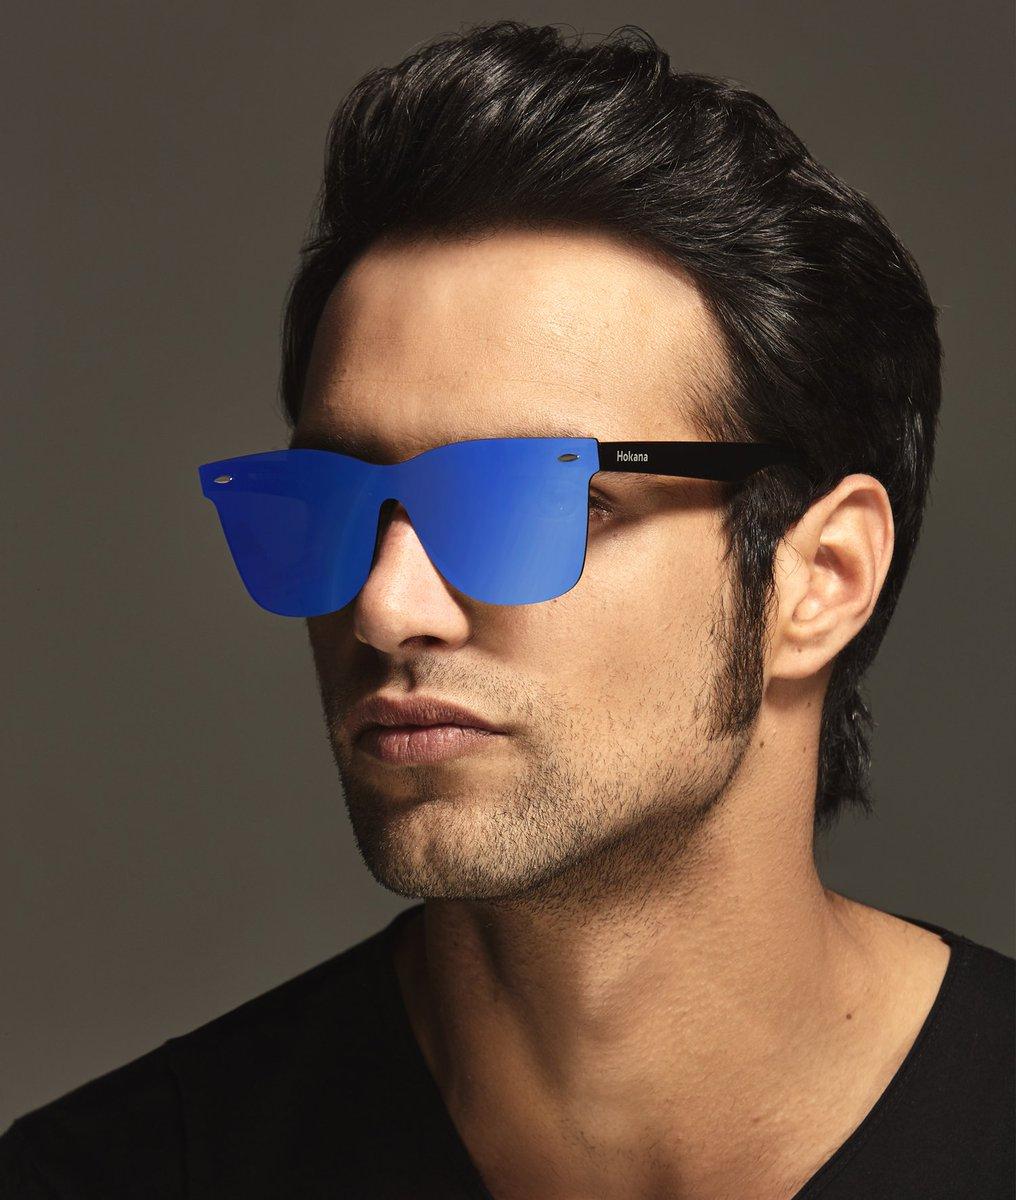 Comorama De trato fácil almohadilla  Hokana Sunglasses on Twitter: